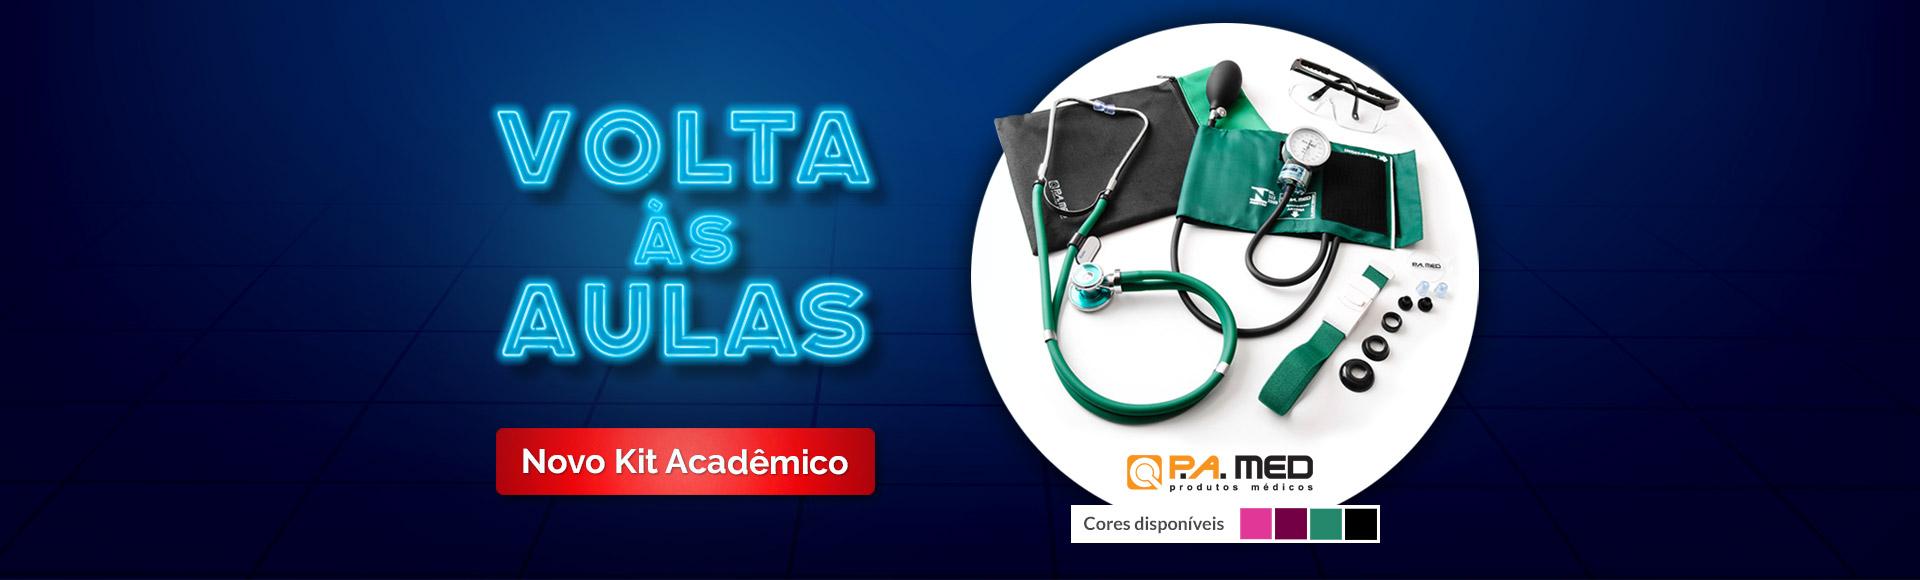 slide-09-kit-pamed-volta-as-aulas-02